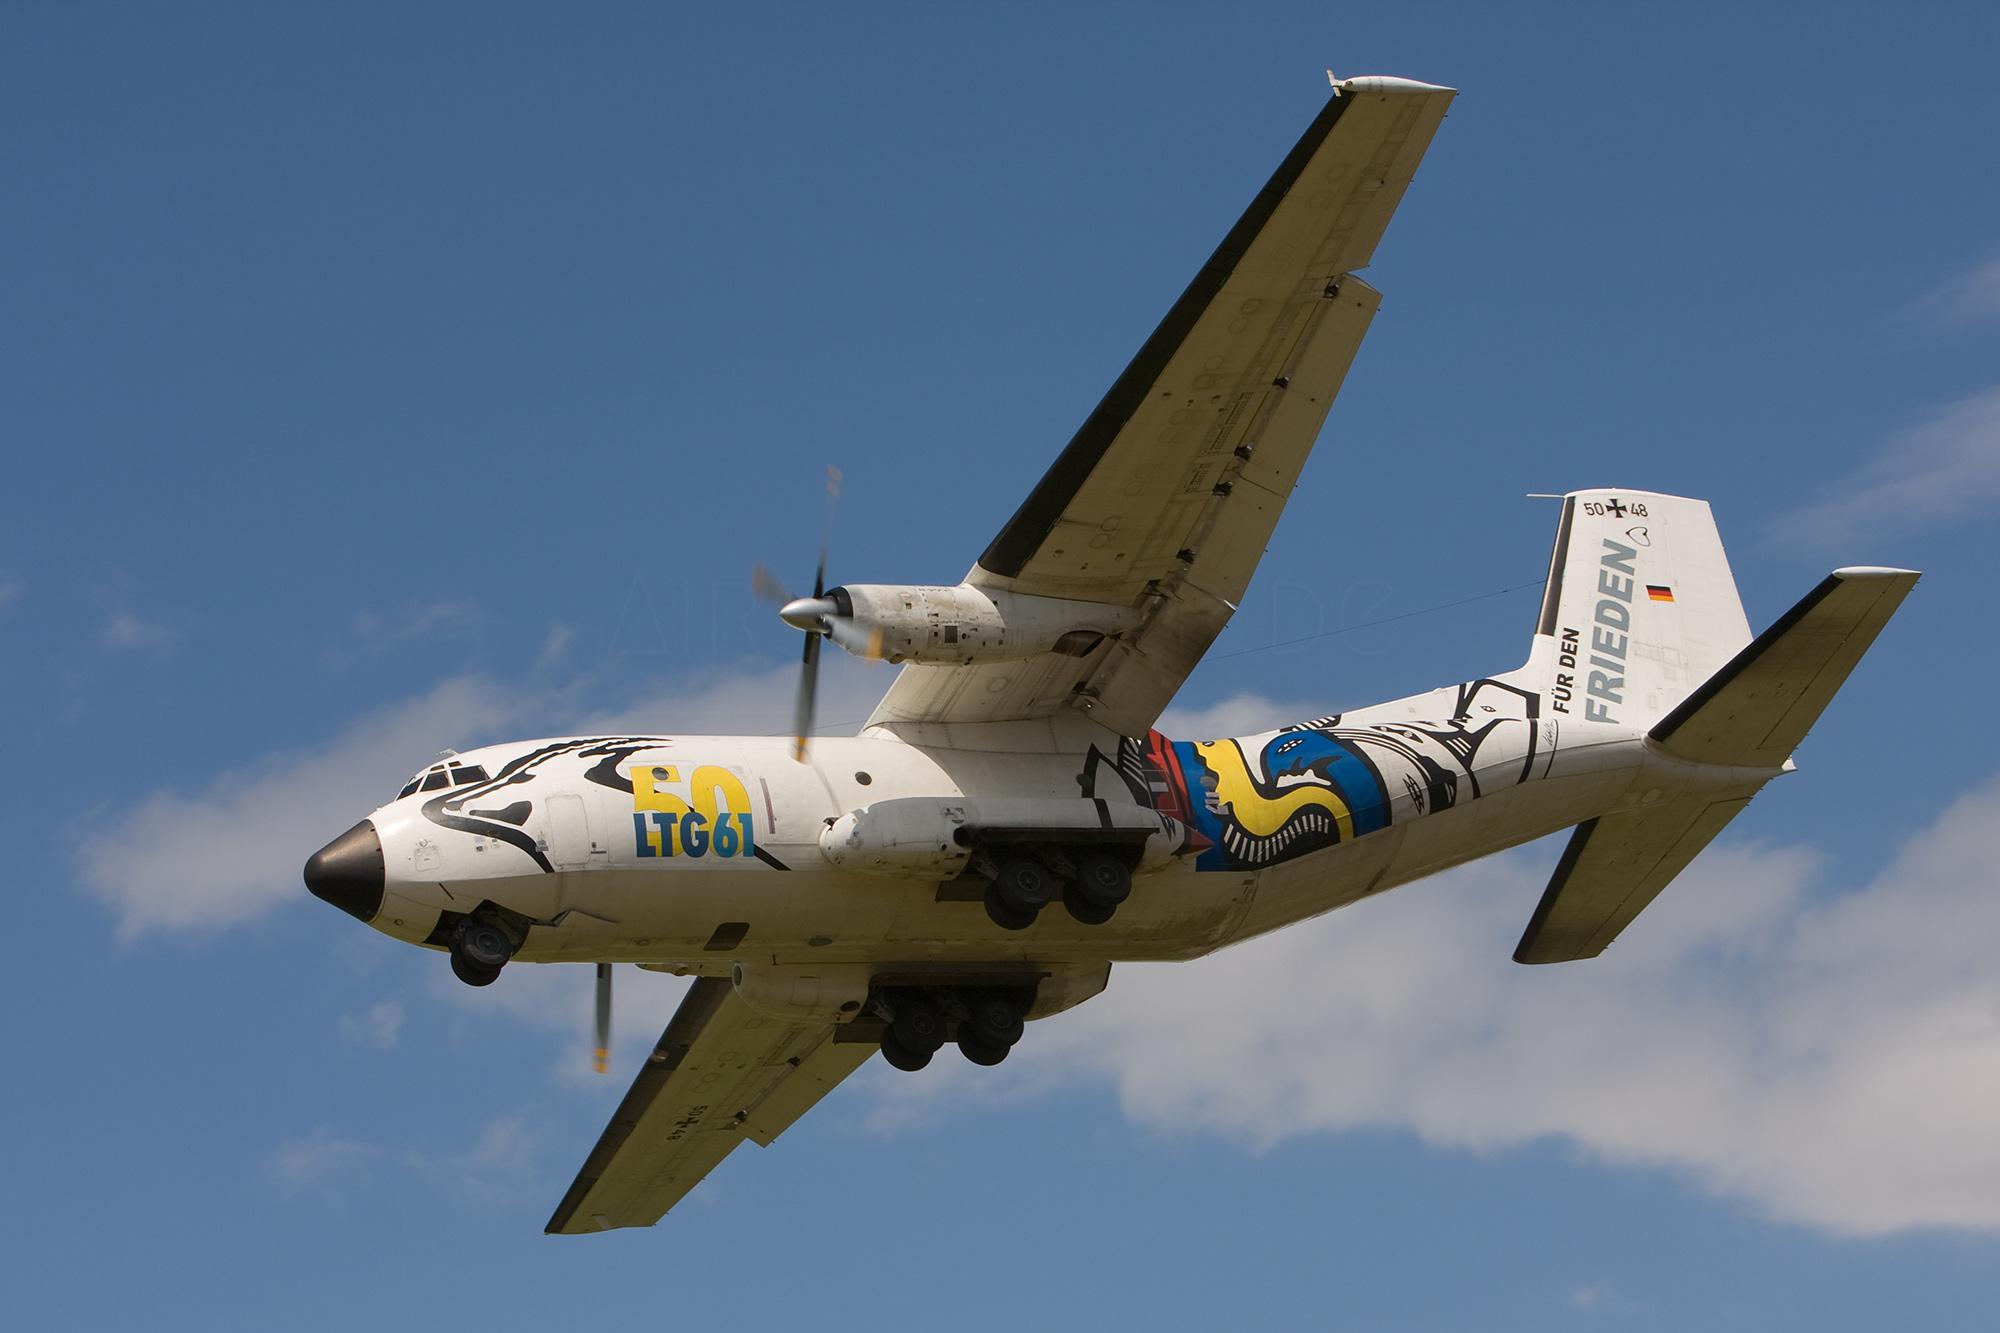 Airspotter.de 2008 Elite Transall C-160 LTG 61